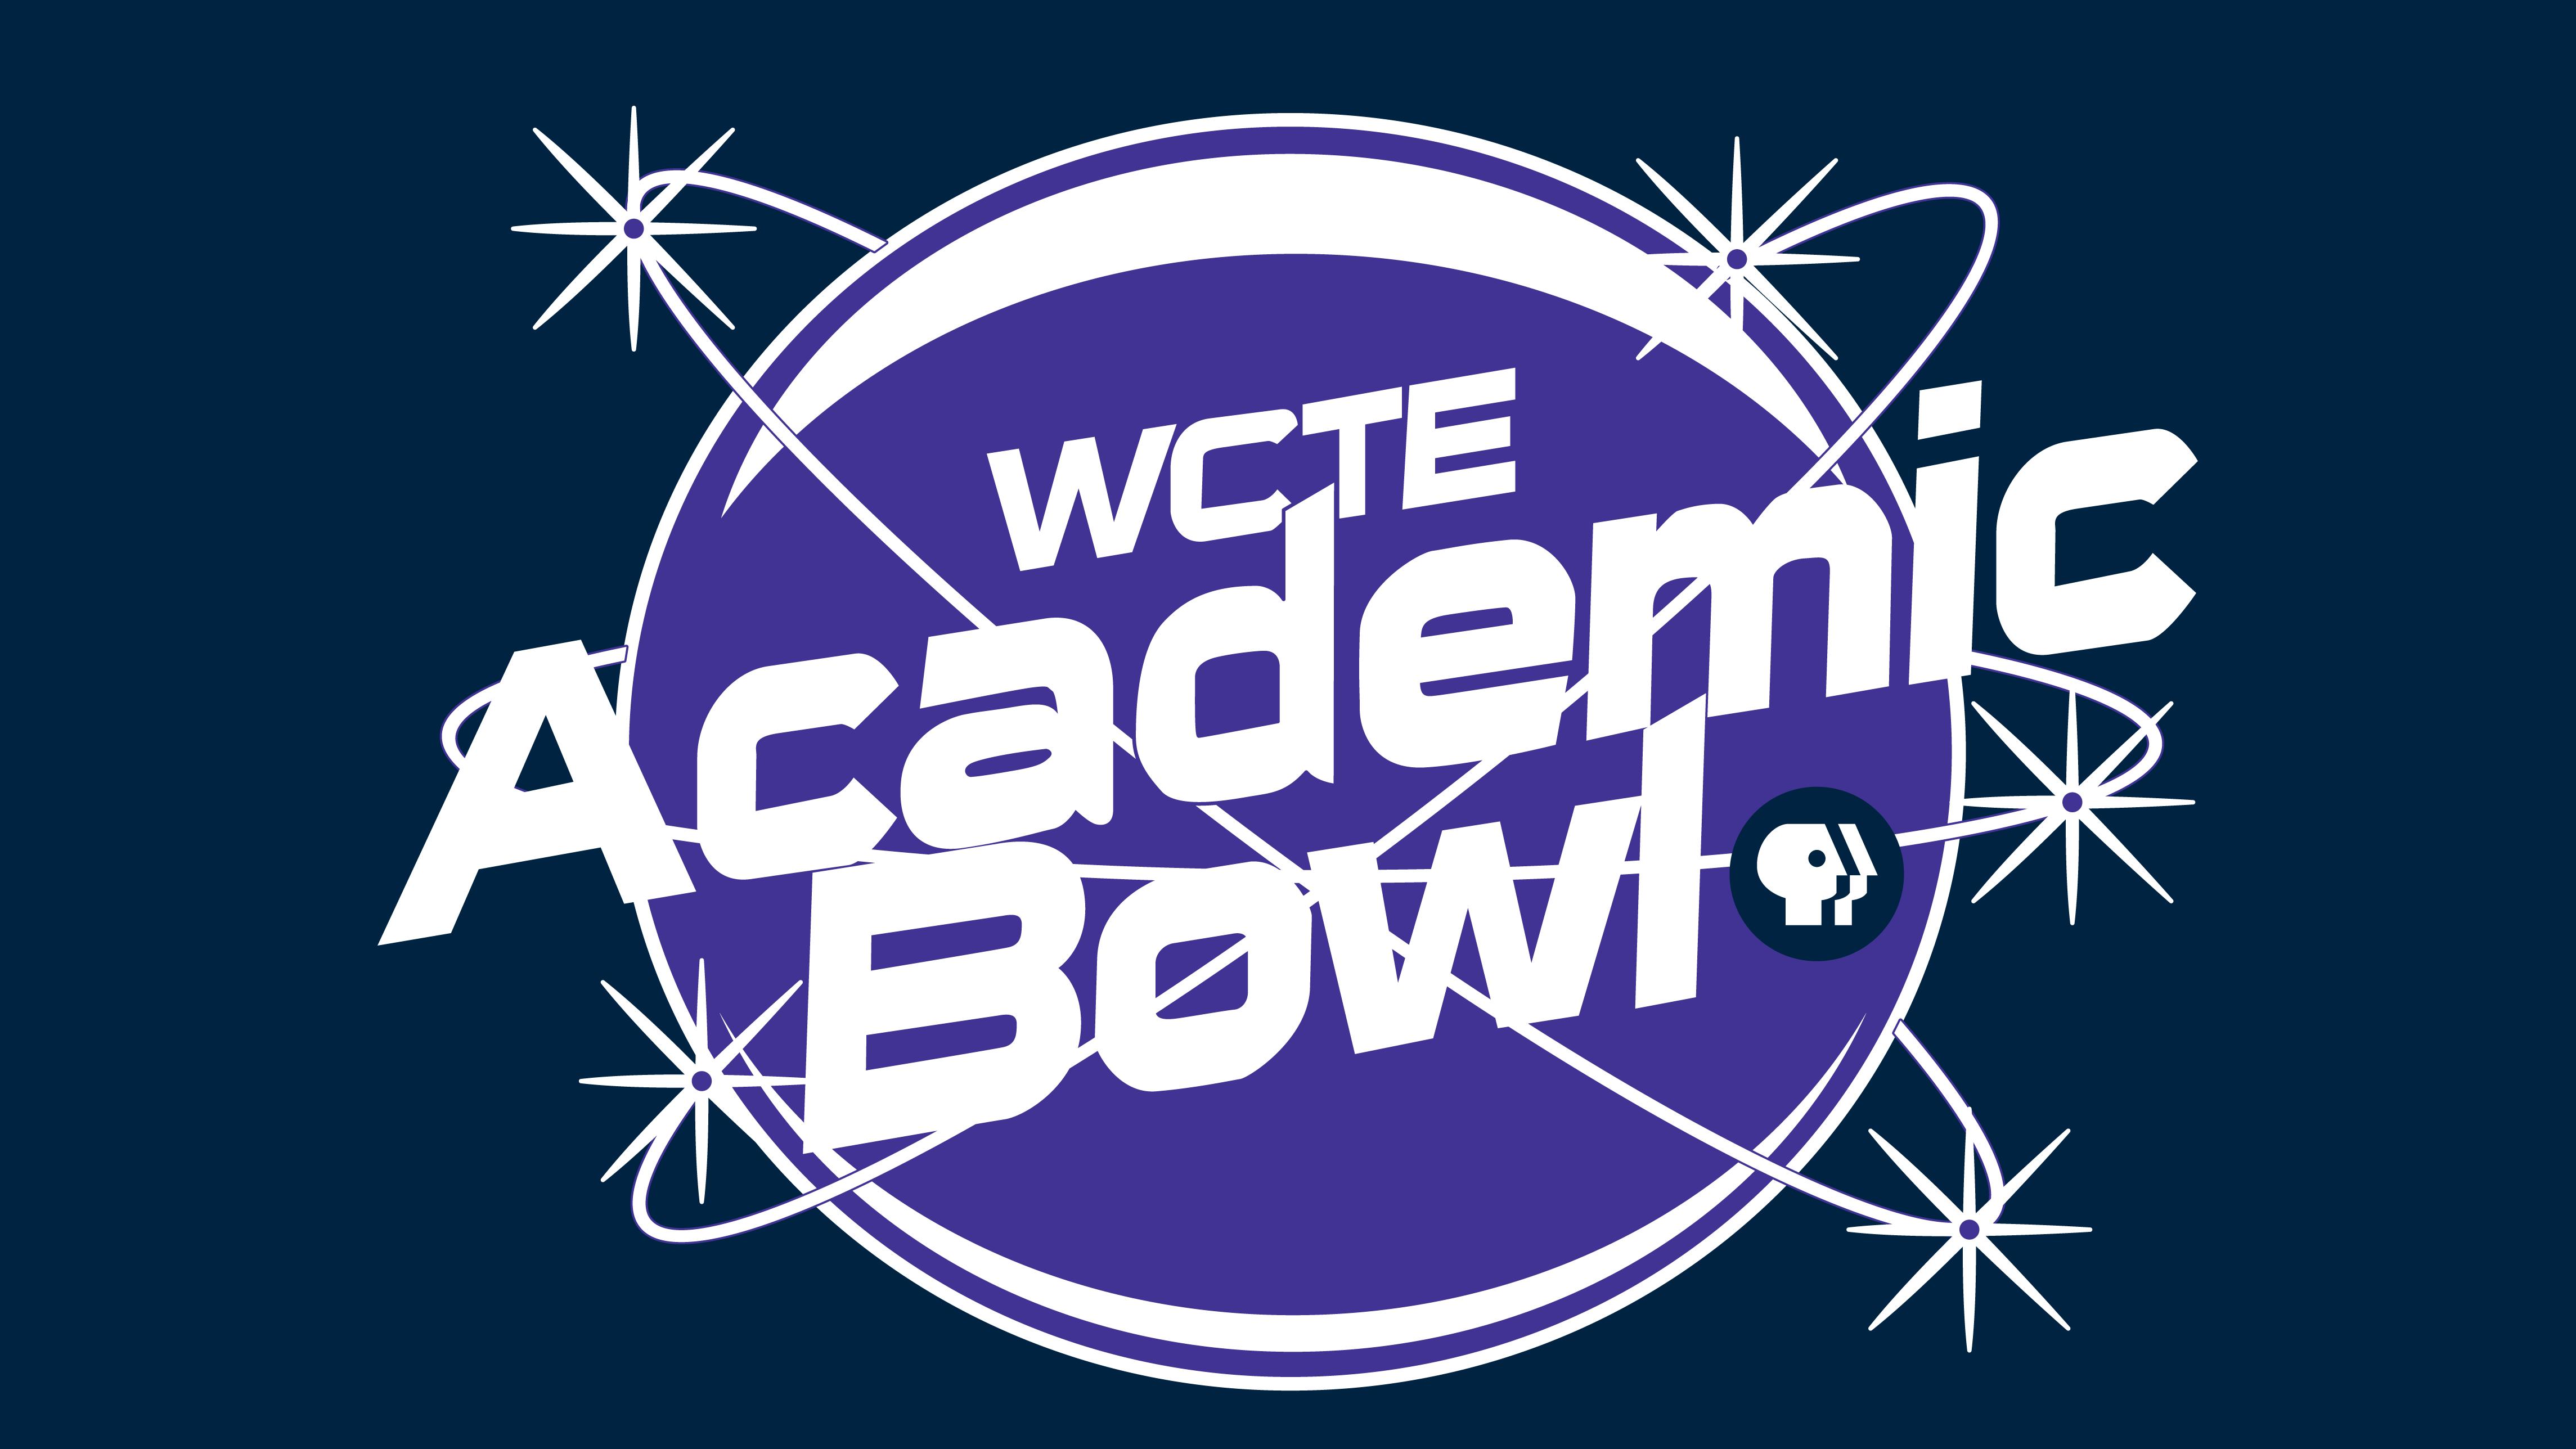 WCTE Academic Bowl